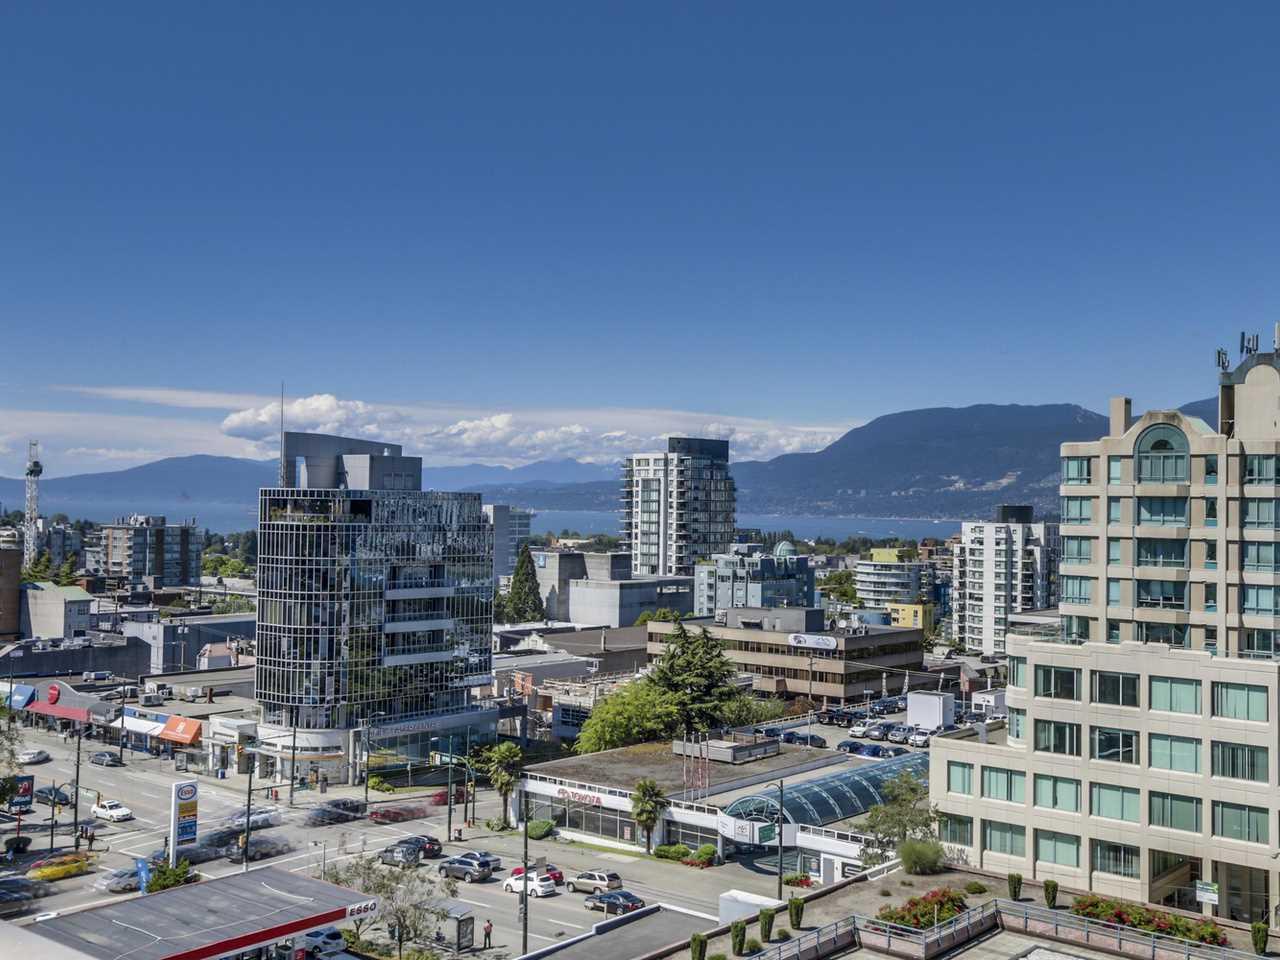 501 1337 W 10TH AVENUE, Vancouver, BC, V6H 1J7 Primary Photo